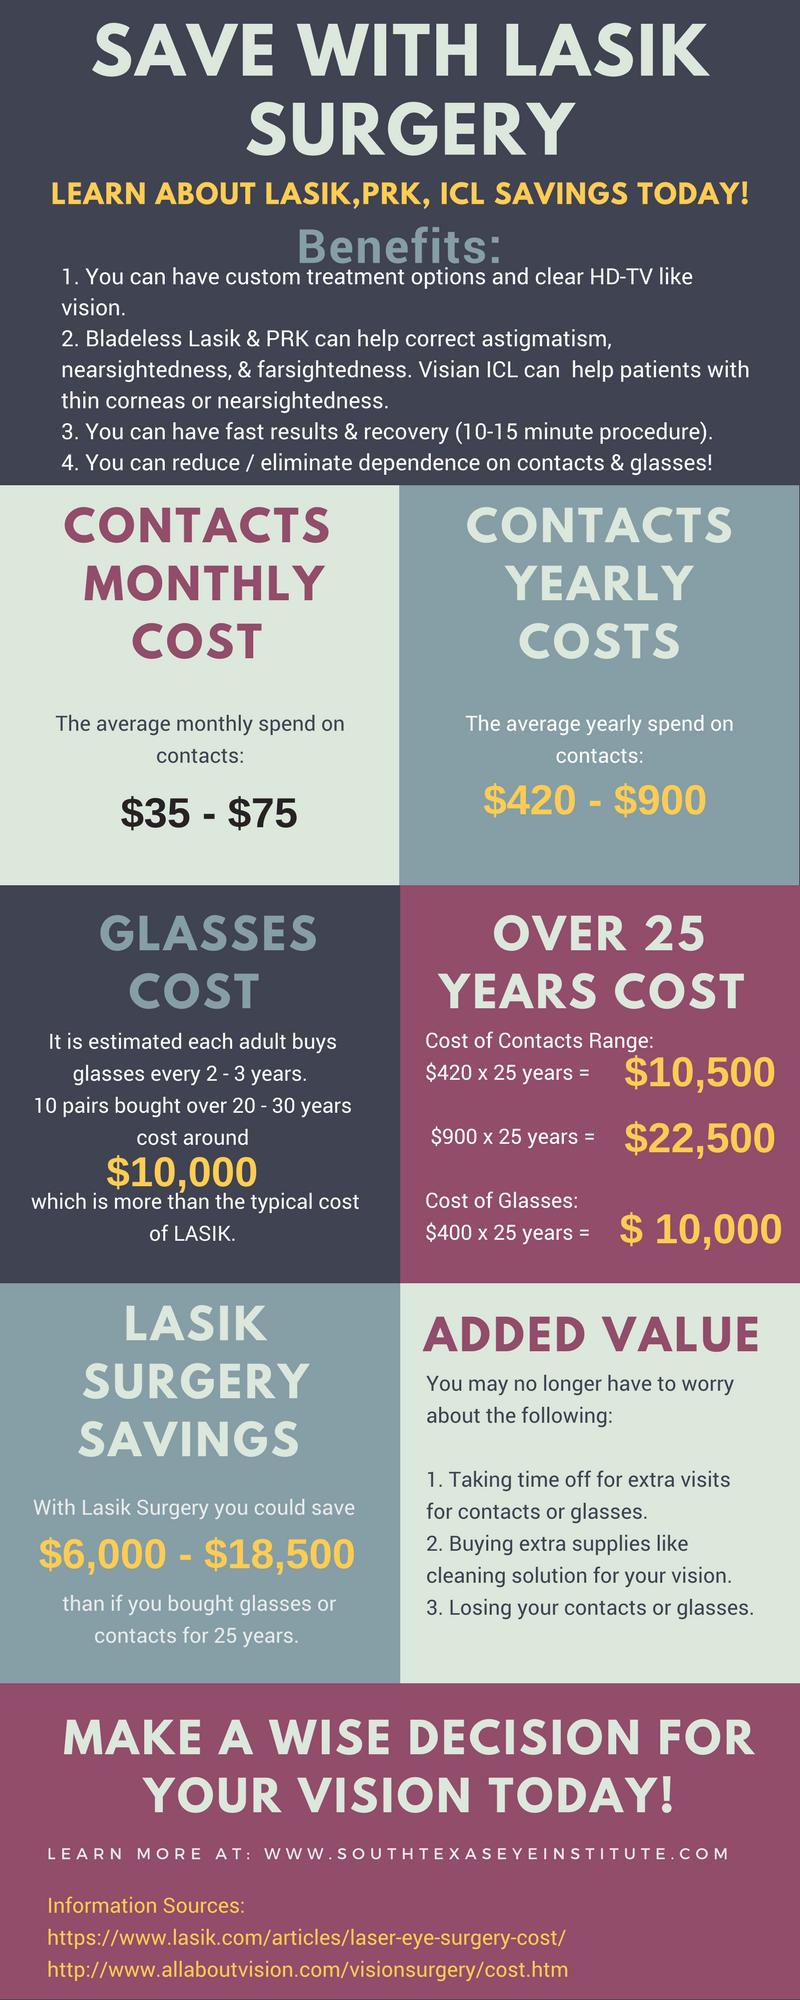 Lasik Savings Calculator San Antonio Cost Of Lasik